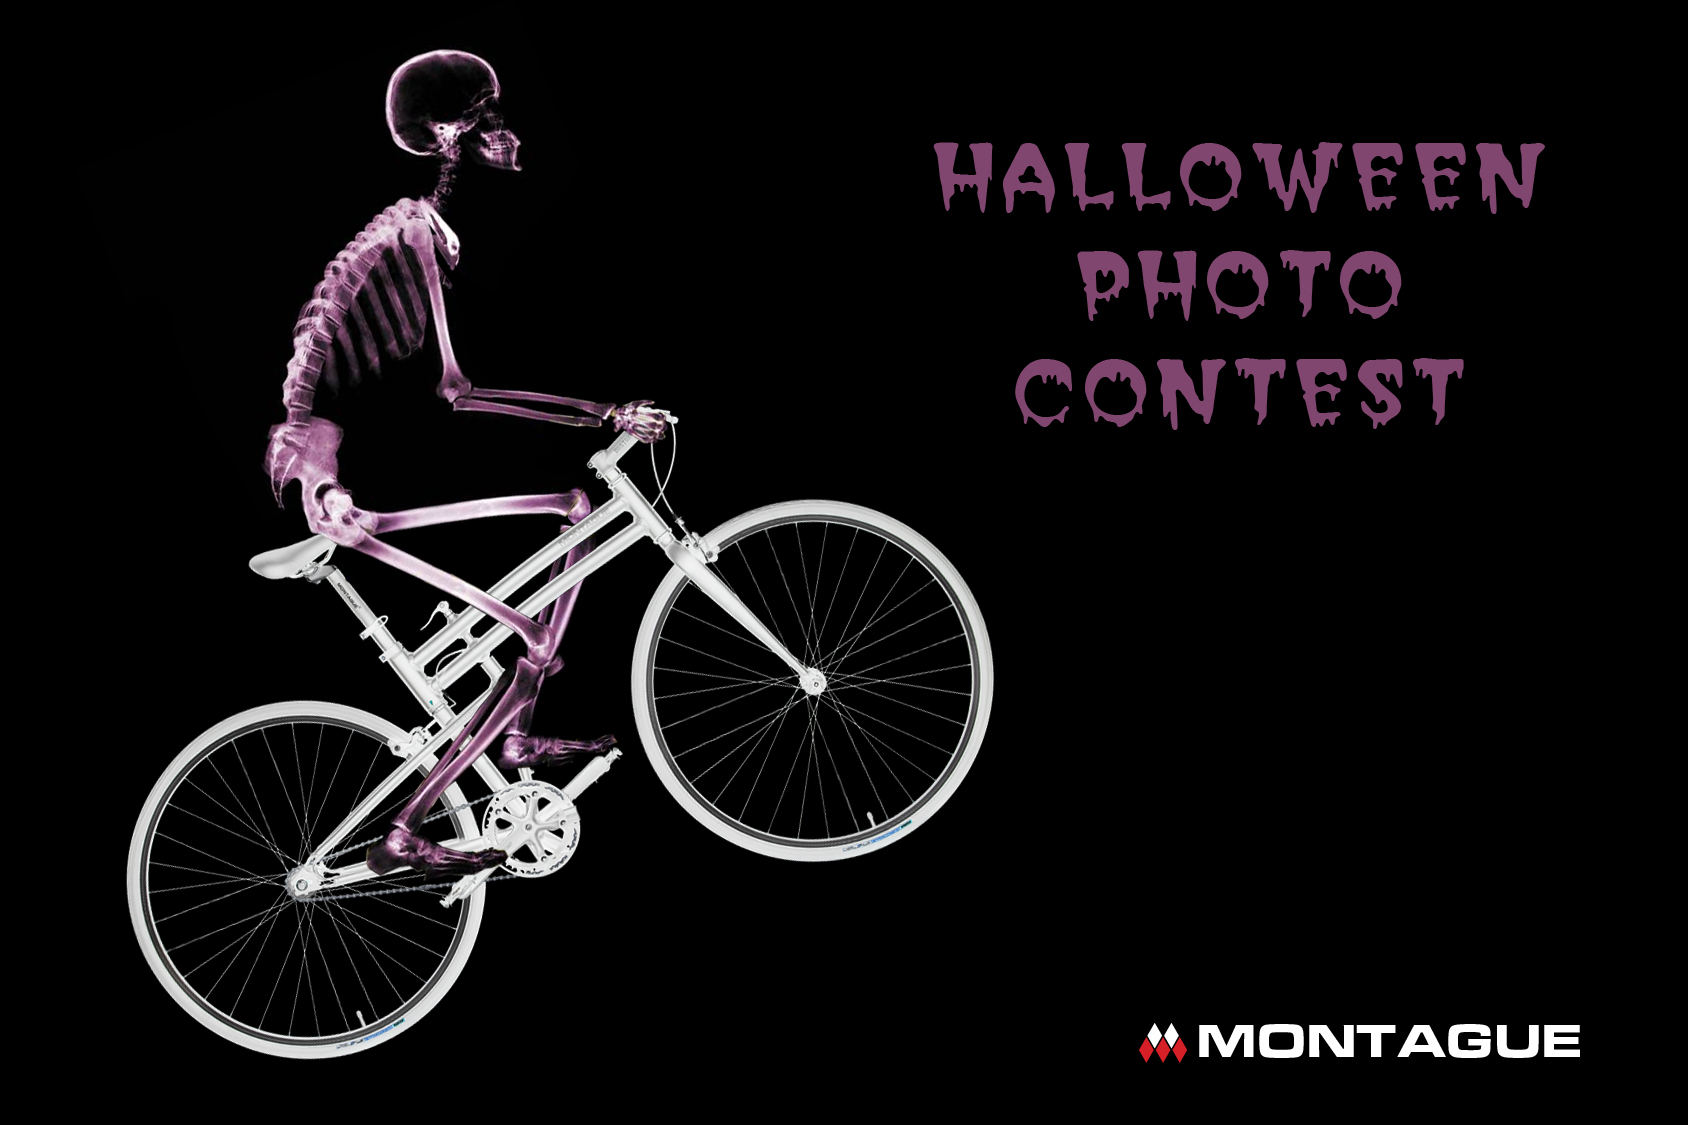 Montague Folding Bike Halloween Contest